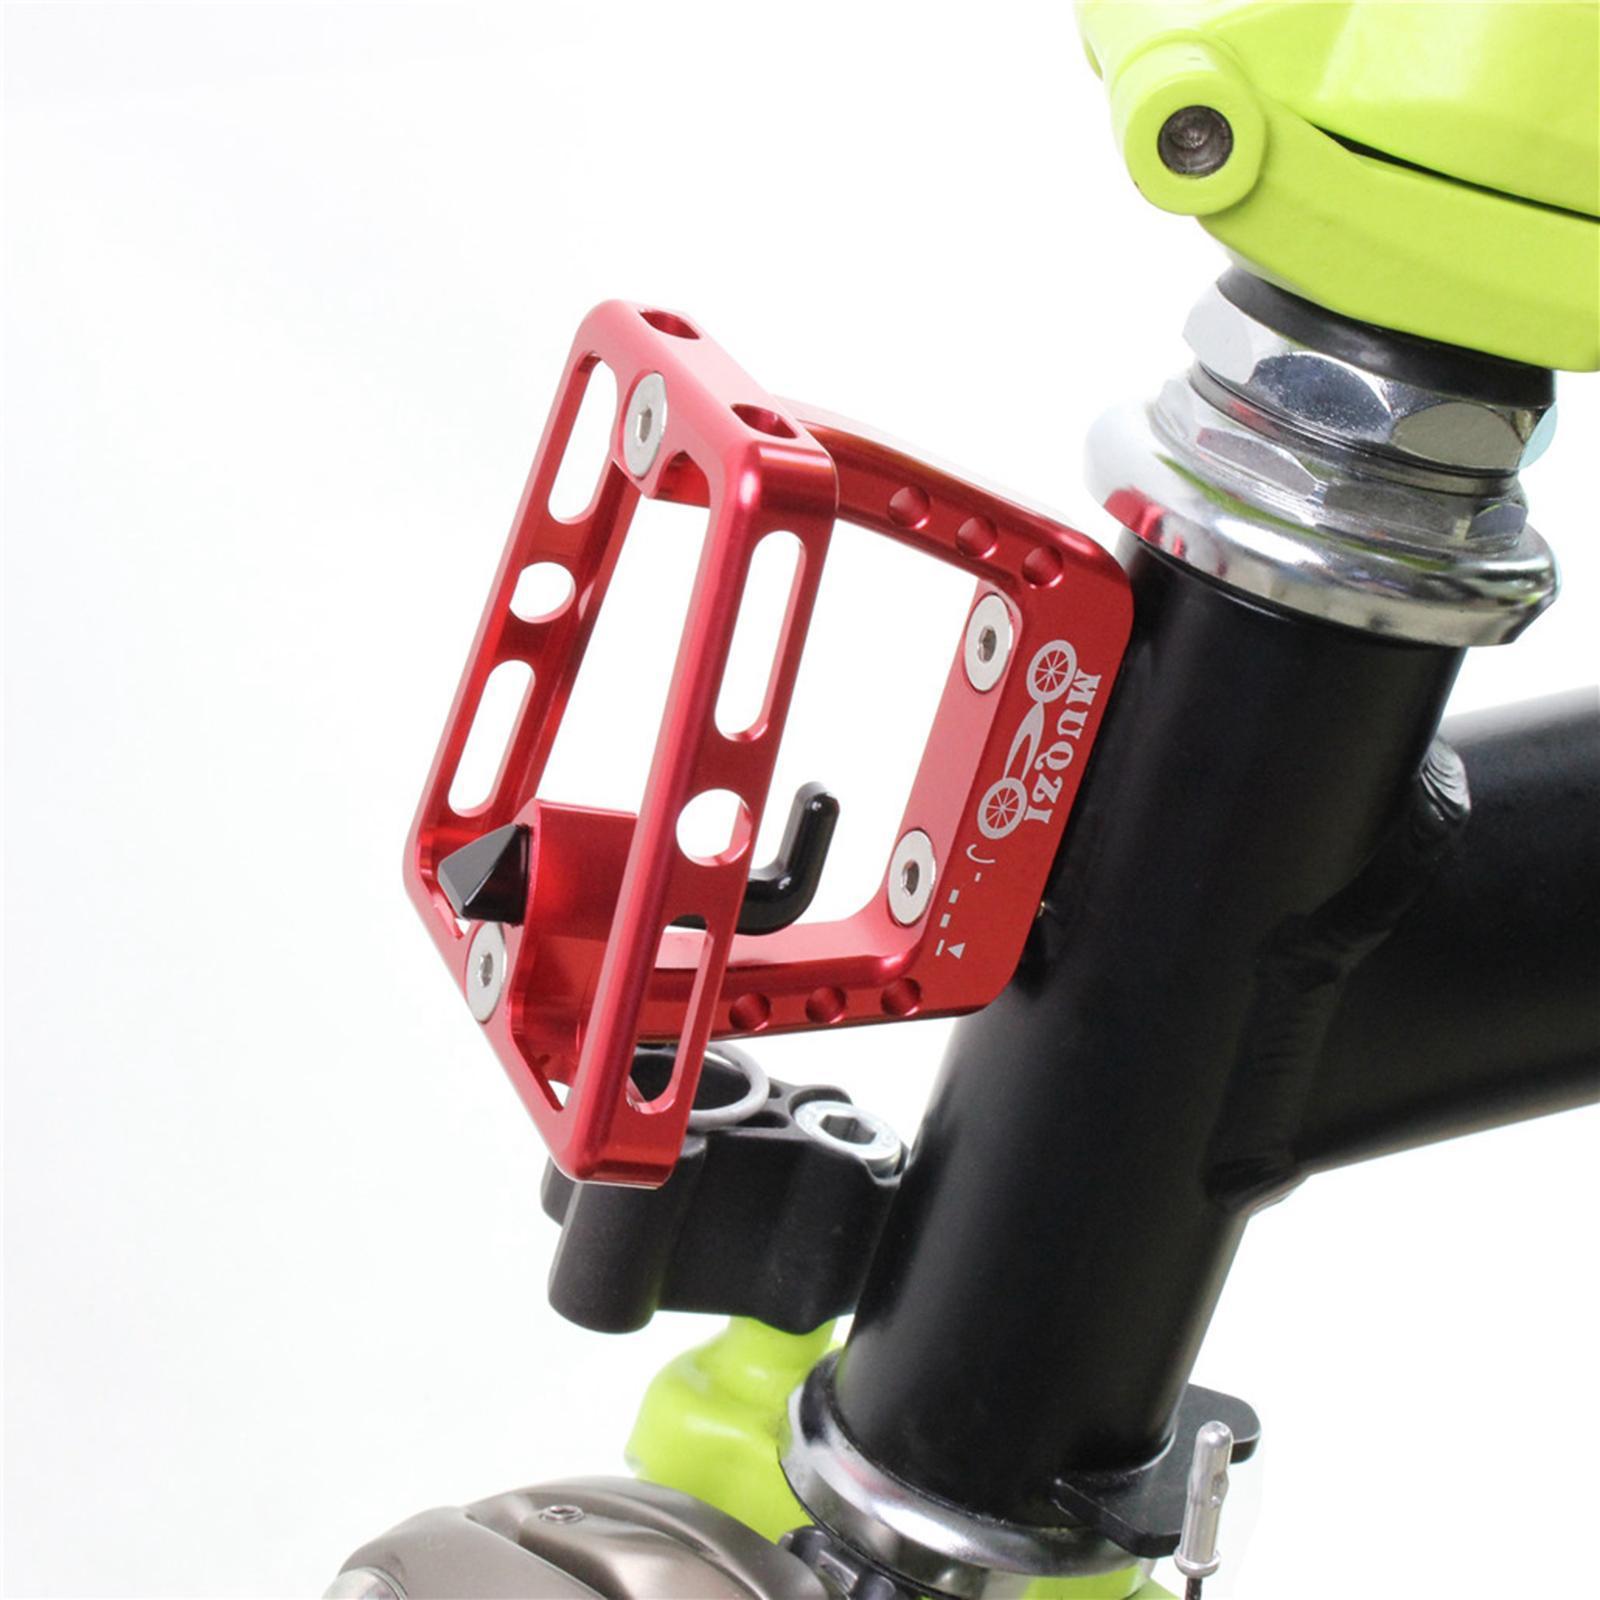 Brompton folding bike front carrier block mounting adaptor bracket cover